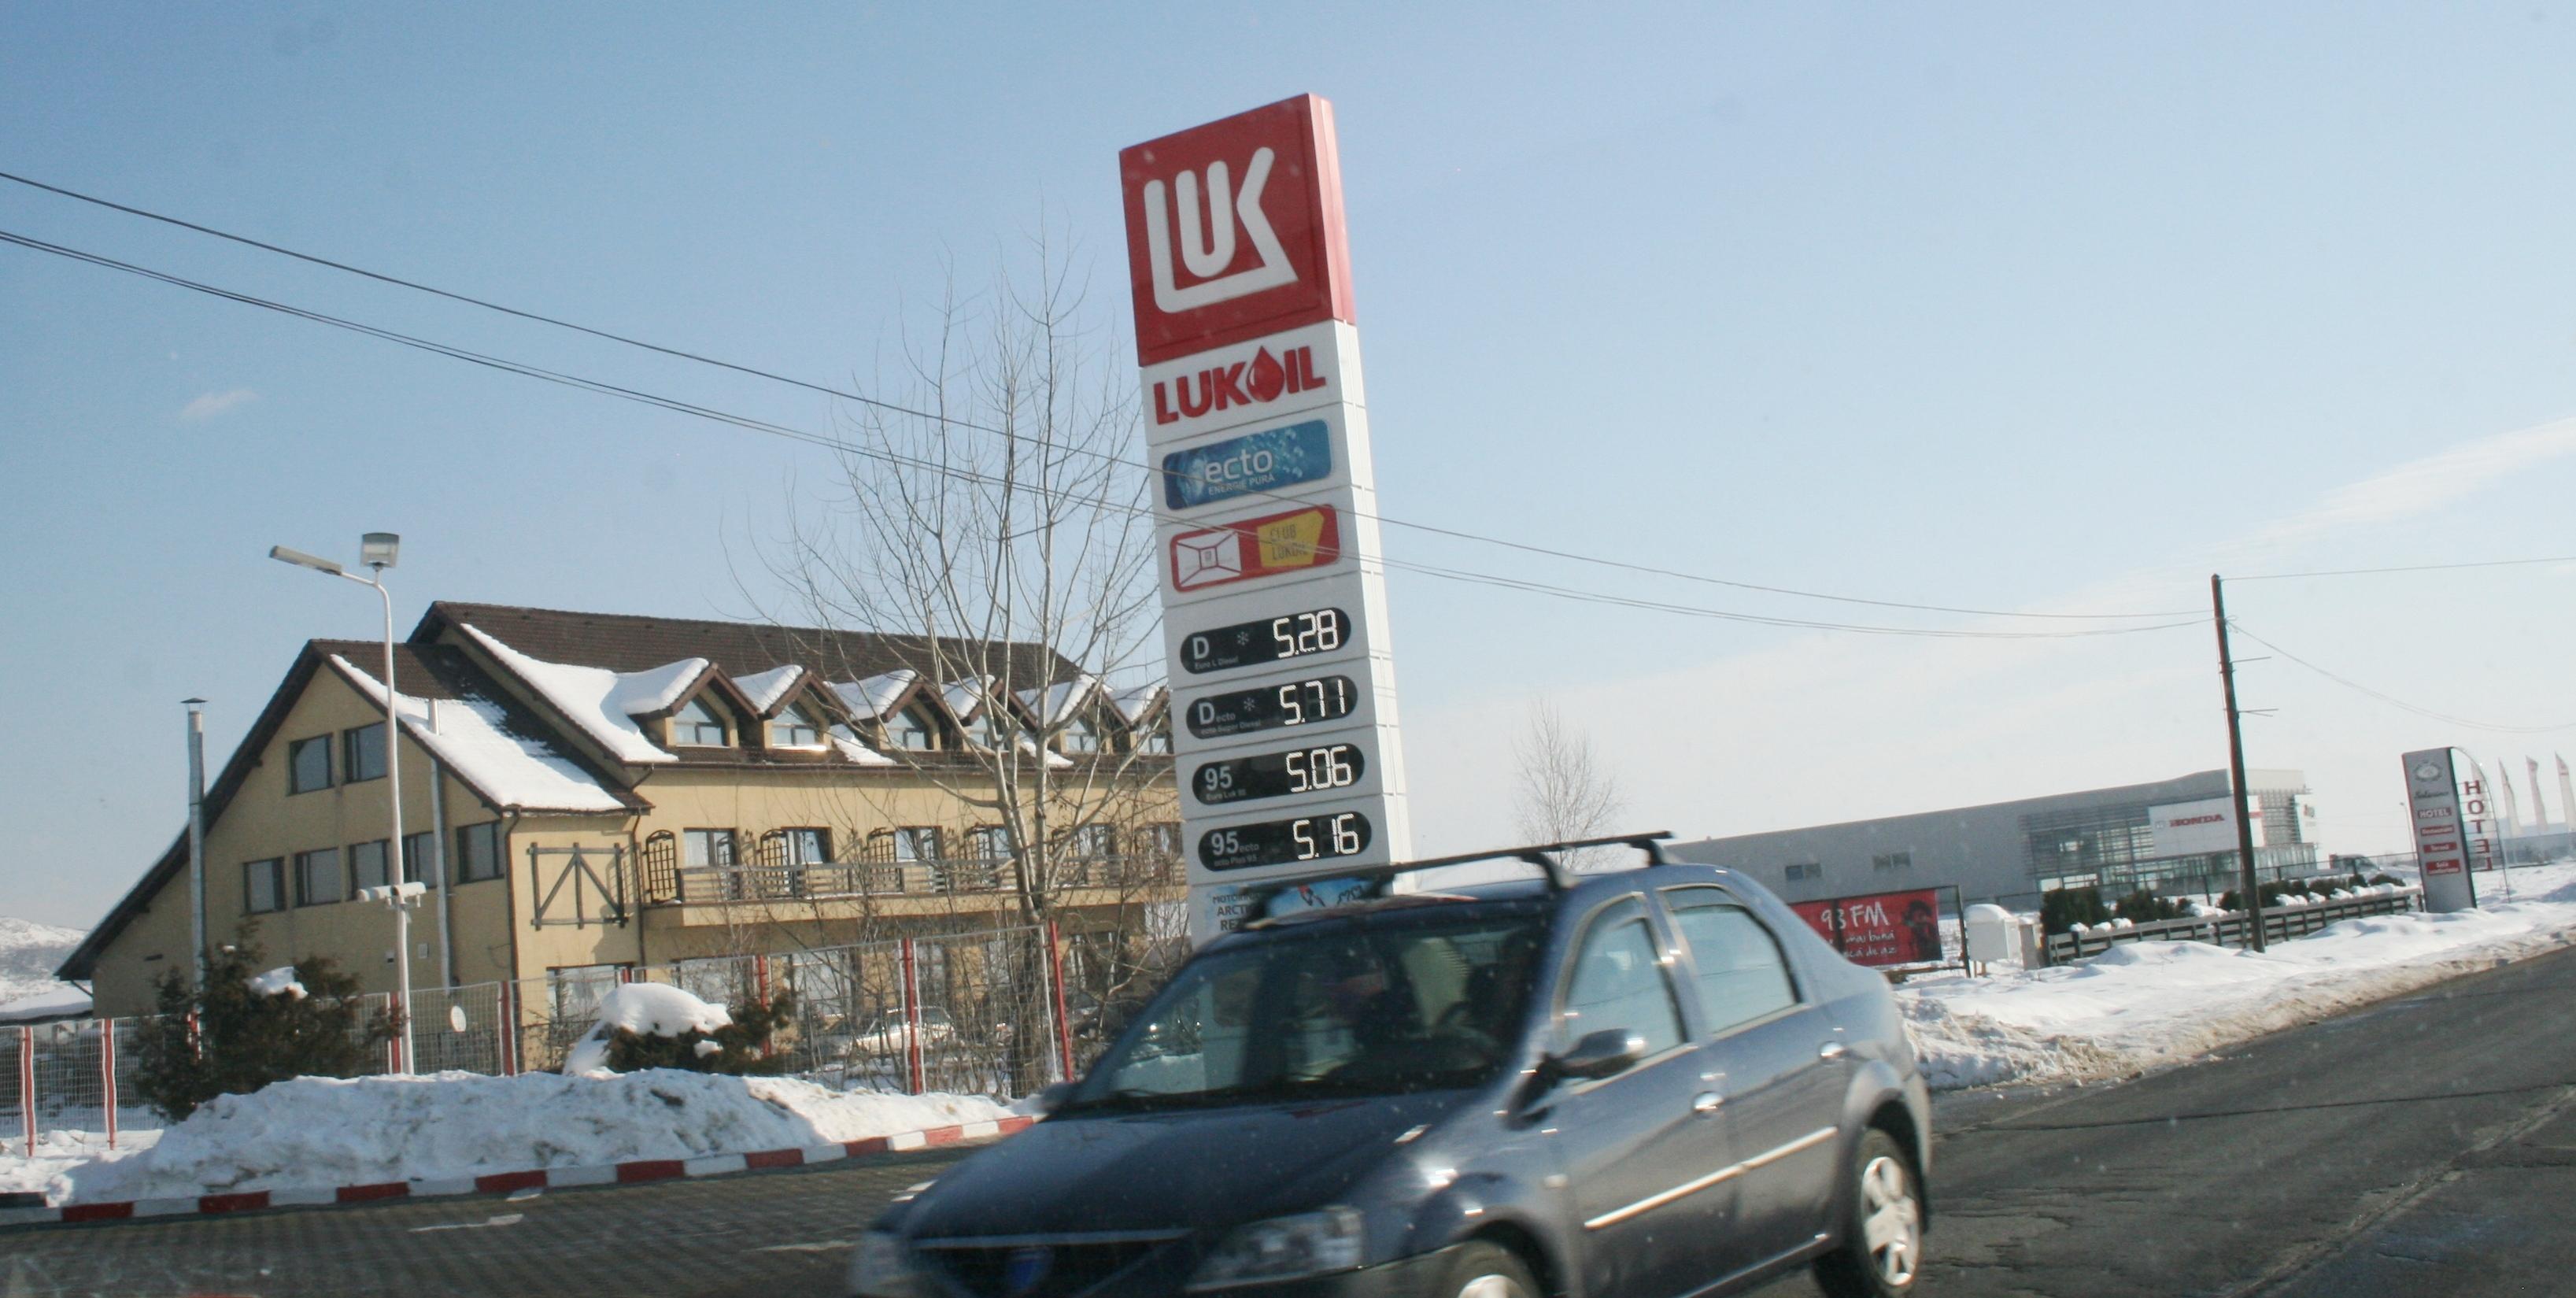 benzinarie, lukoil, carburant, zapada, iarna 3 -Jean-Mihai PALSU